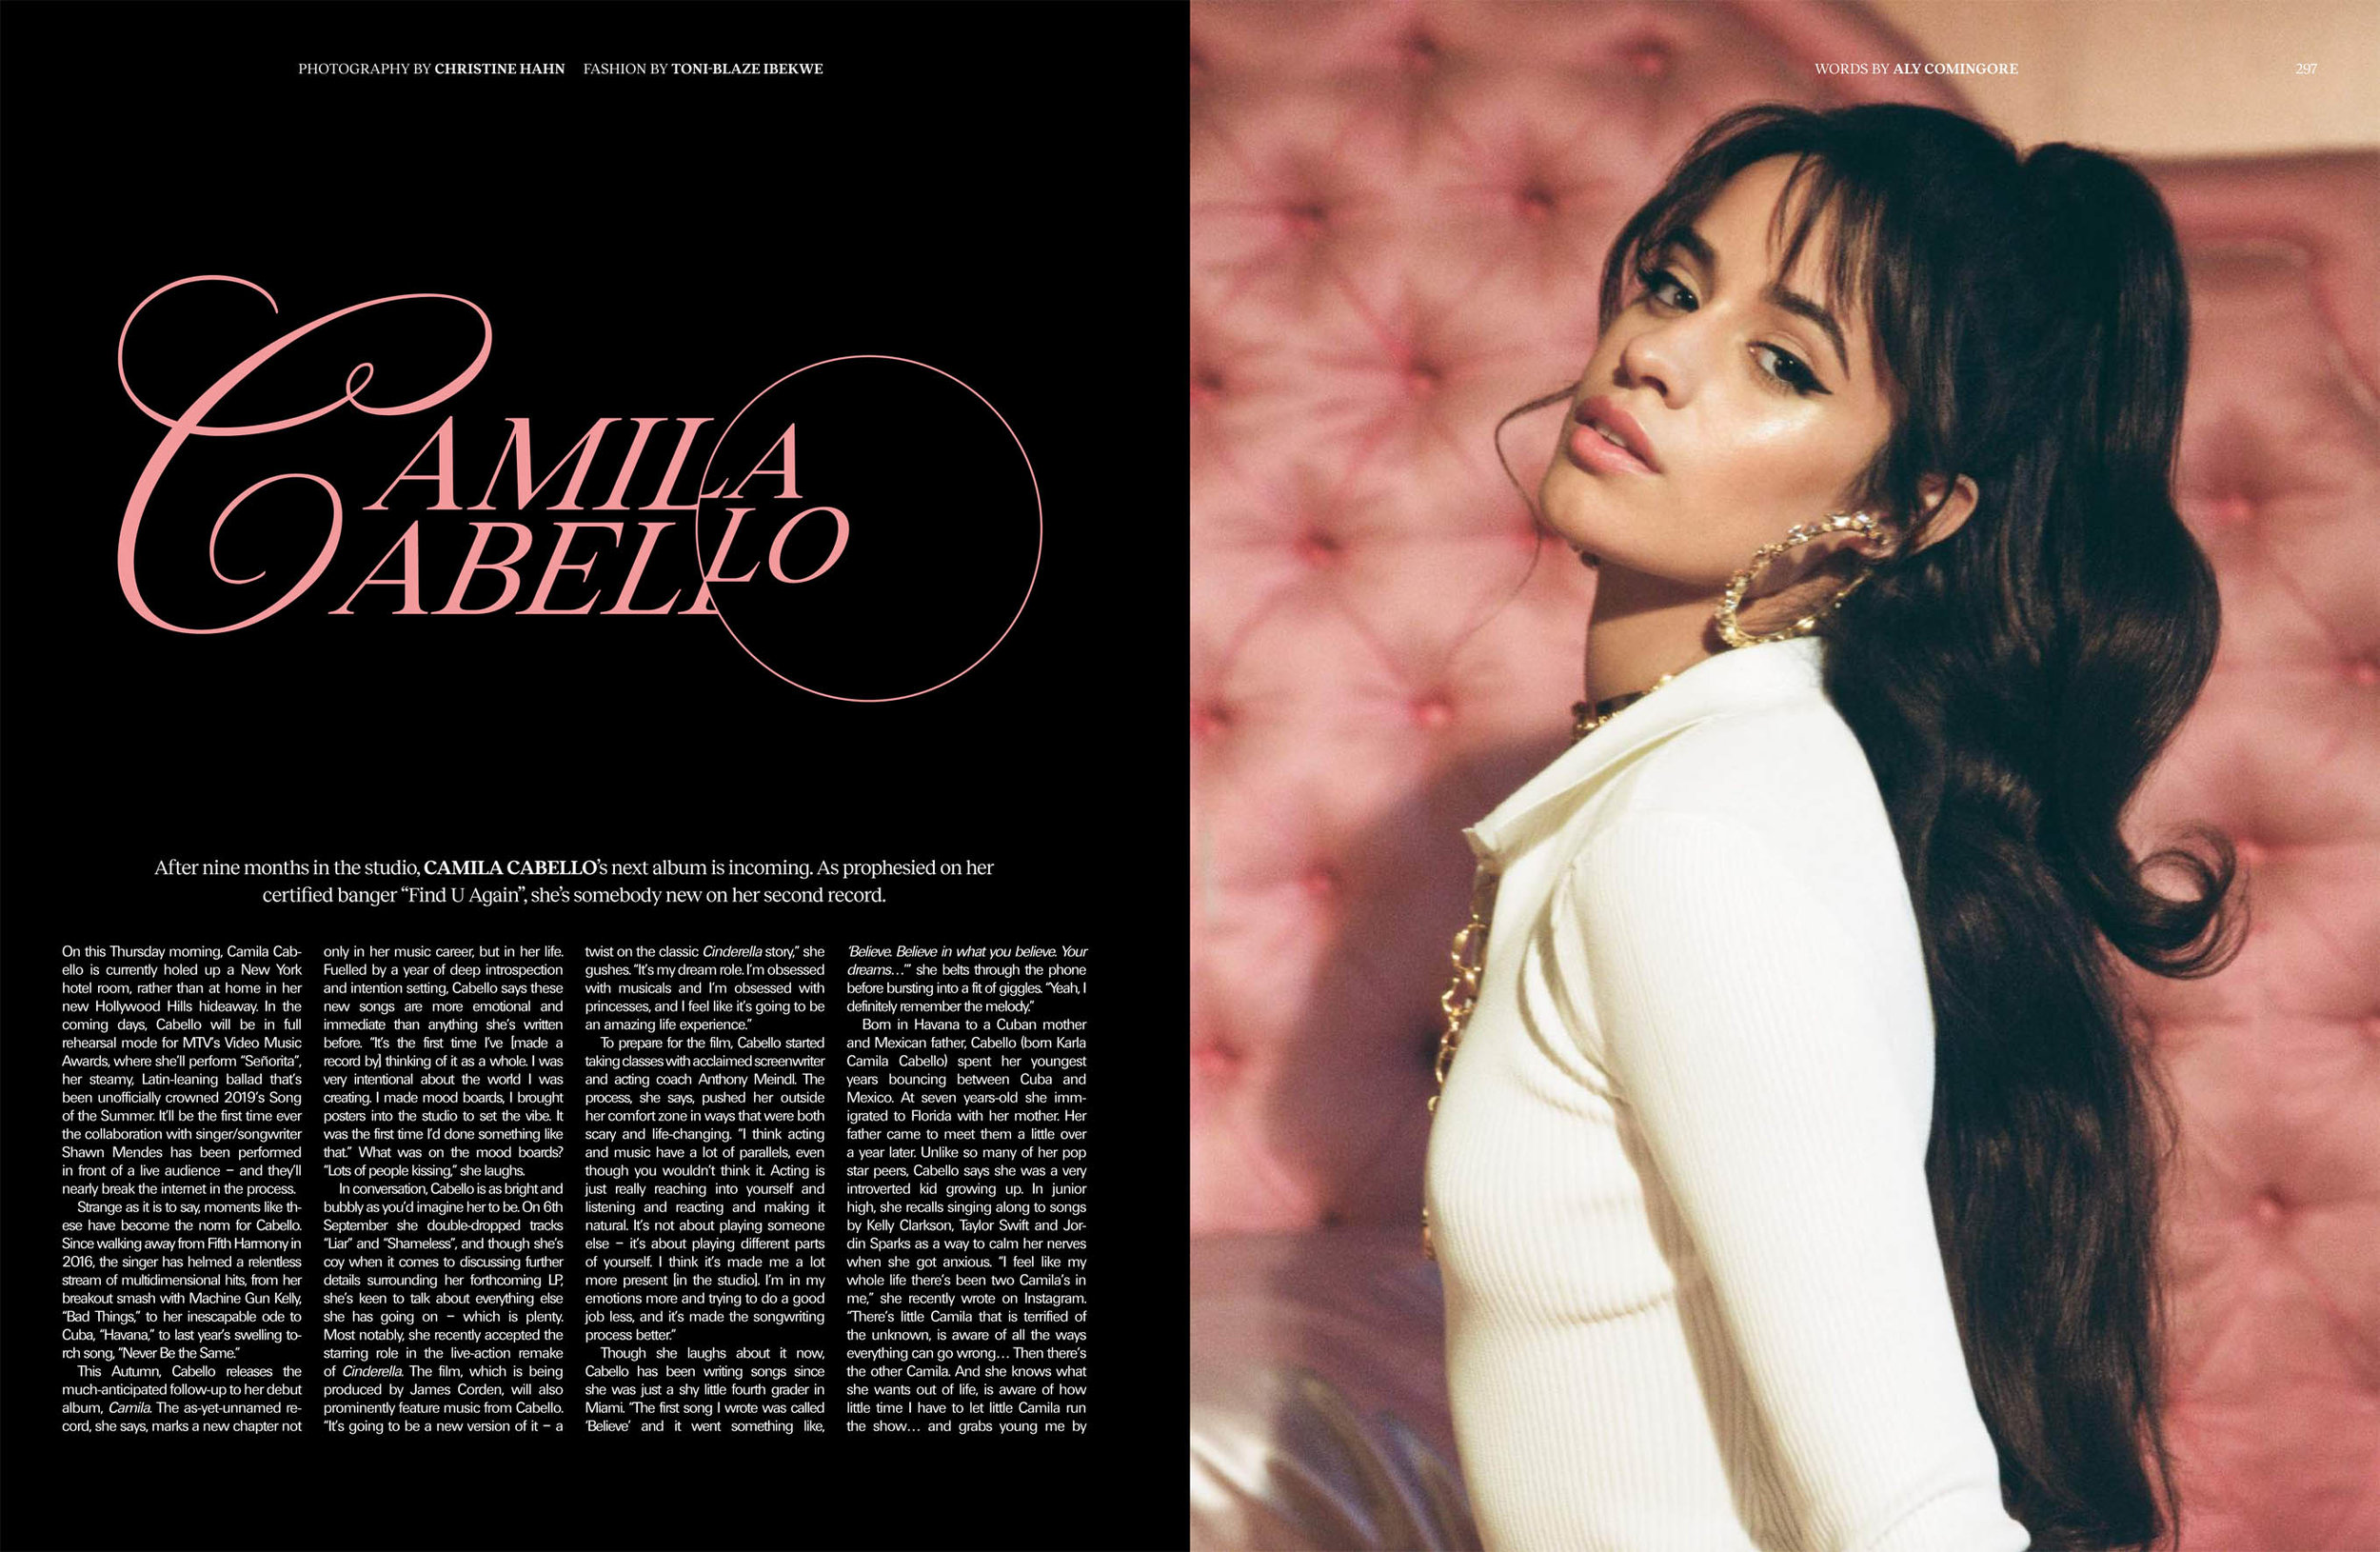 Camila Cabello-Claudia Savage-Wonderland editorial -Page1_online.jpg